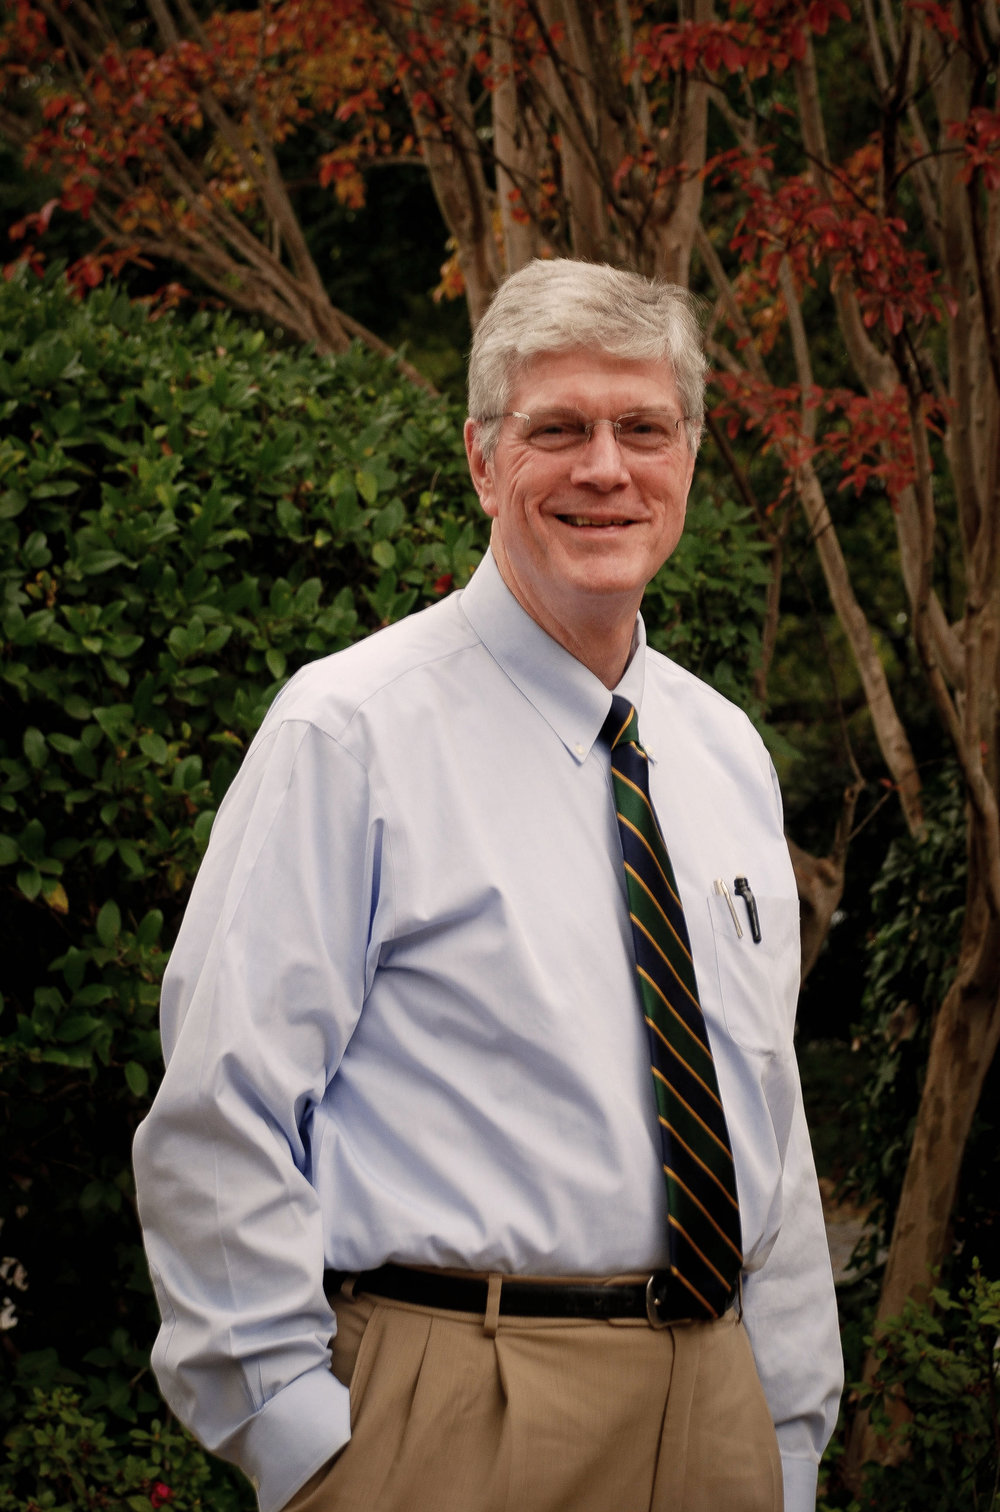 Jim H. Seay, Jr. ,AIA, NCARB, LEED AP  Senior Principal, Architect